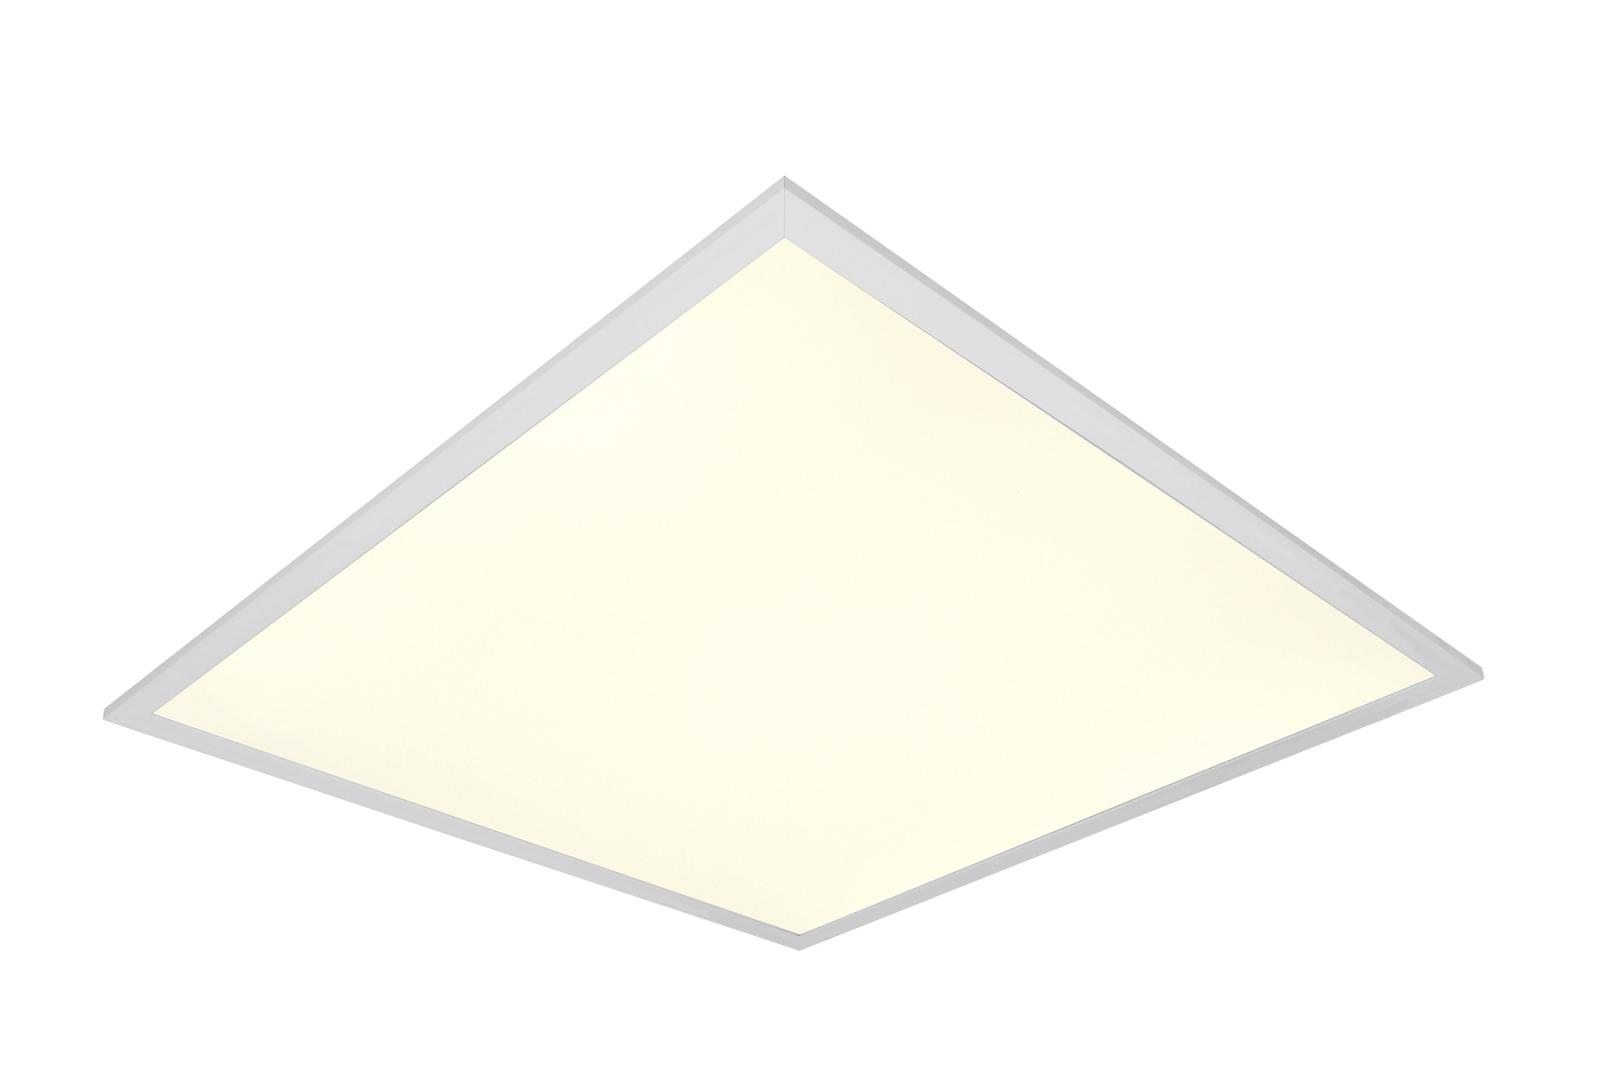 Panou LED pătrat alb 40W 230V IP20 4000K